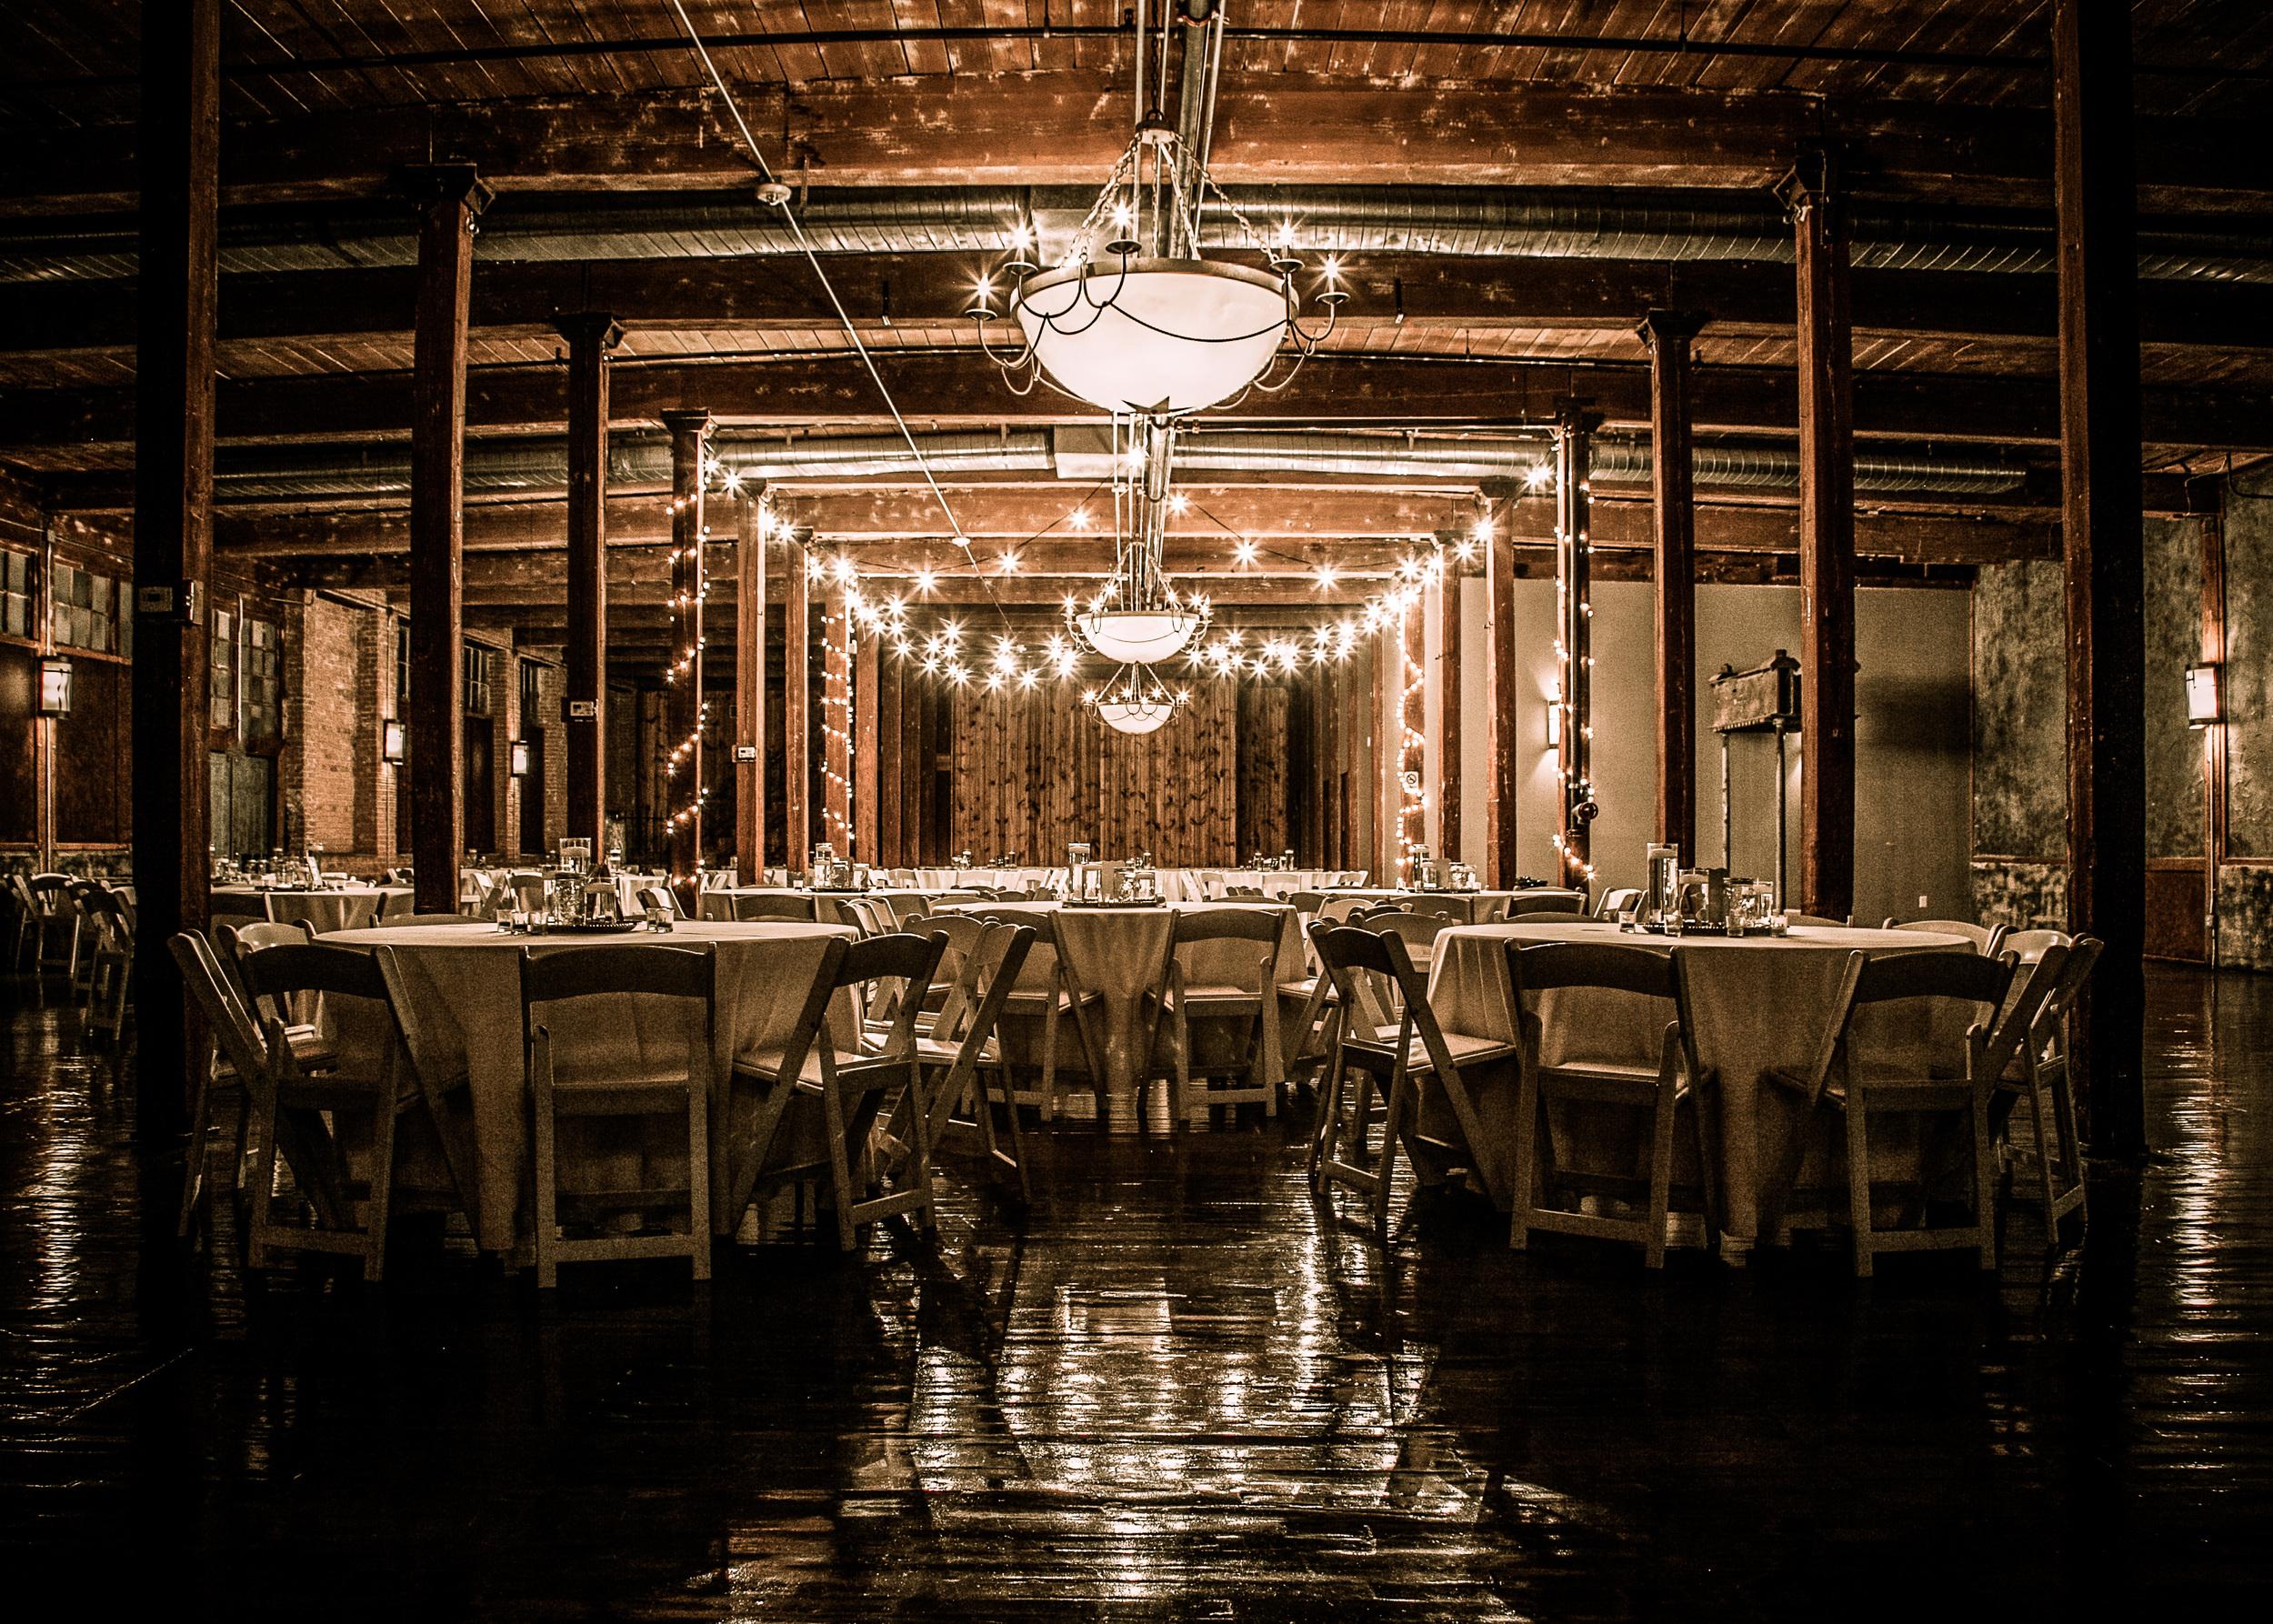 Cafe Lights-Nighttime.jpg